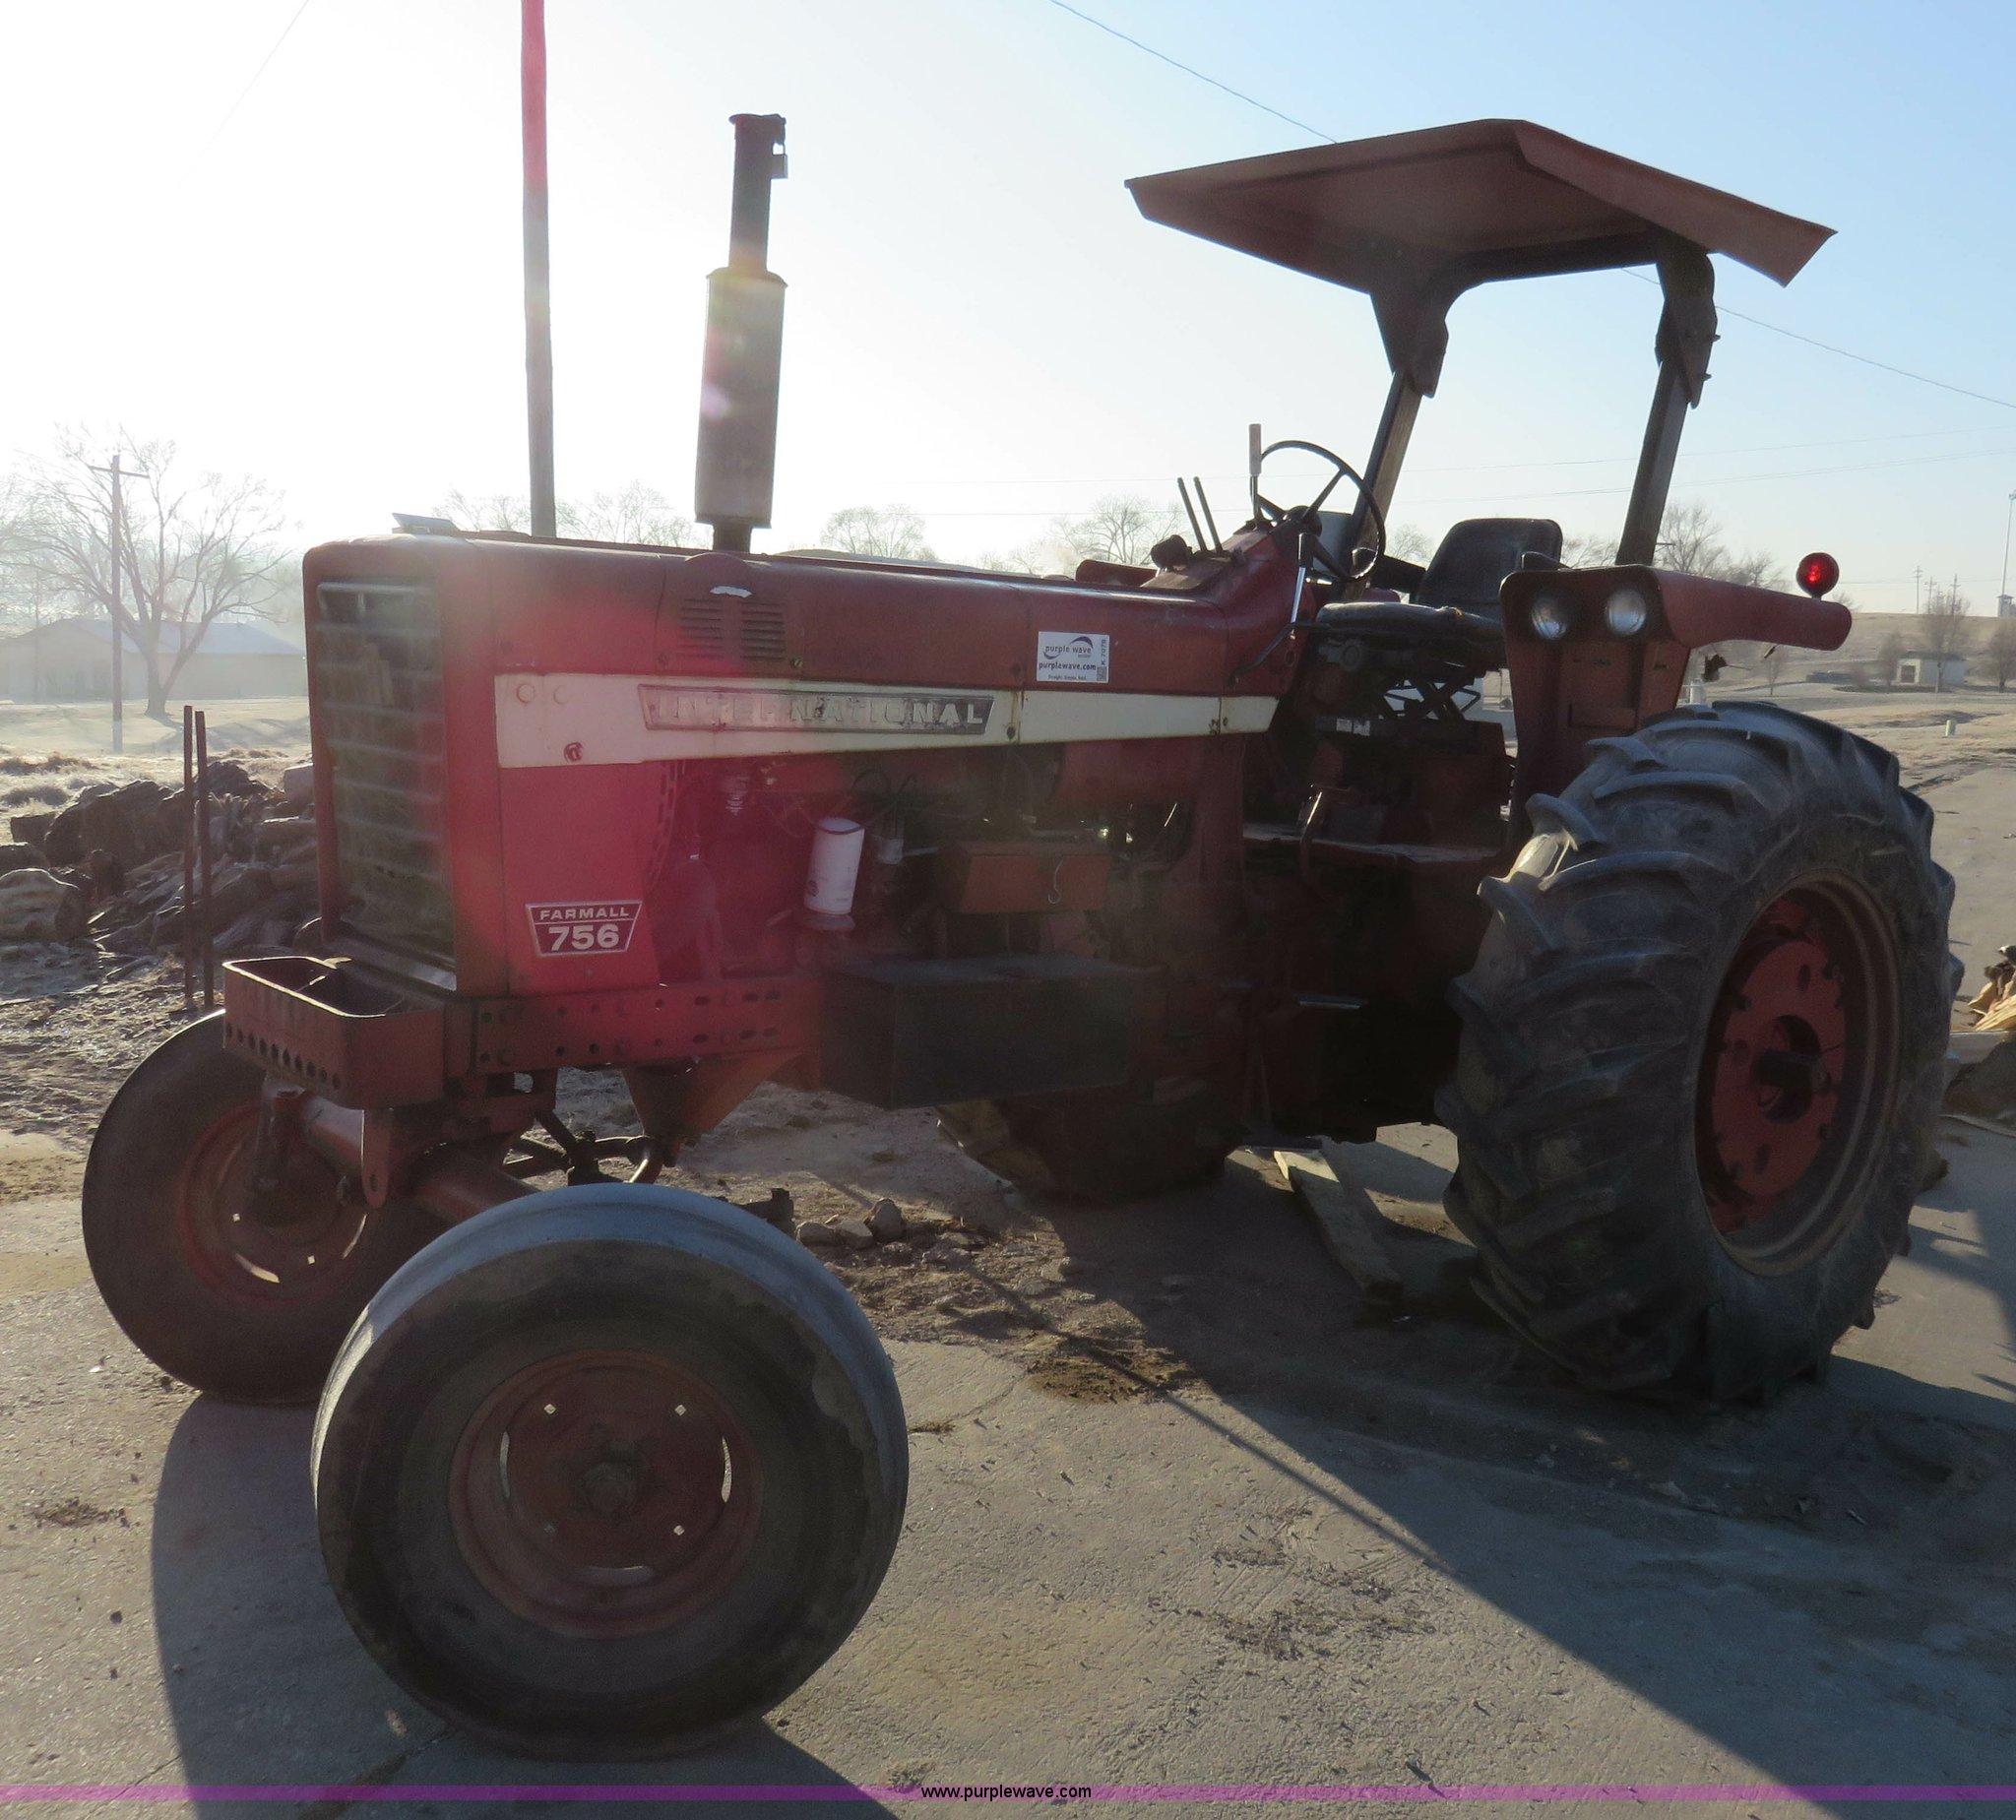 1969 International Farmall 756 tractor for sale in Kansas